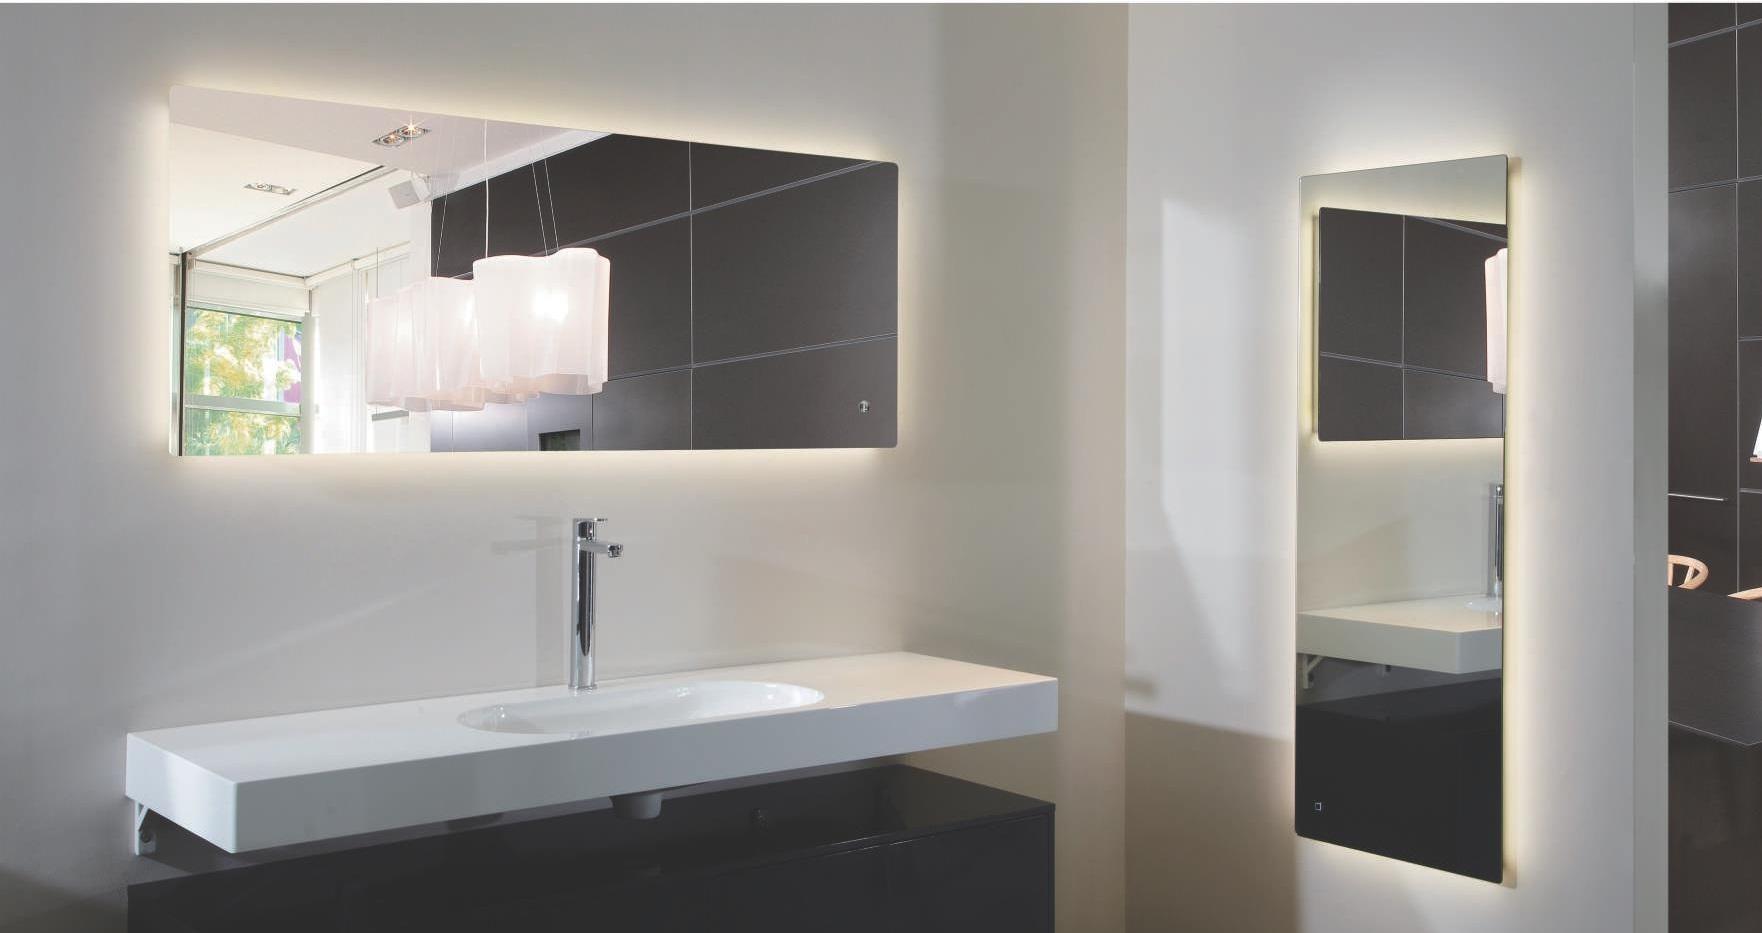 Afina Illume Led Backlit Rectangular Bathroom Mirror Of With Back With Regard To Led Illuminated Bathroom Mirrors (Image 1 of 20)